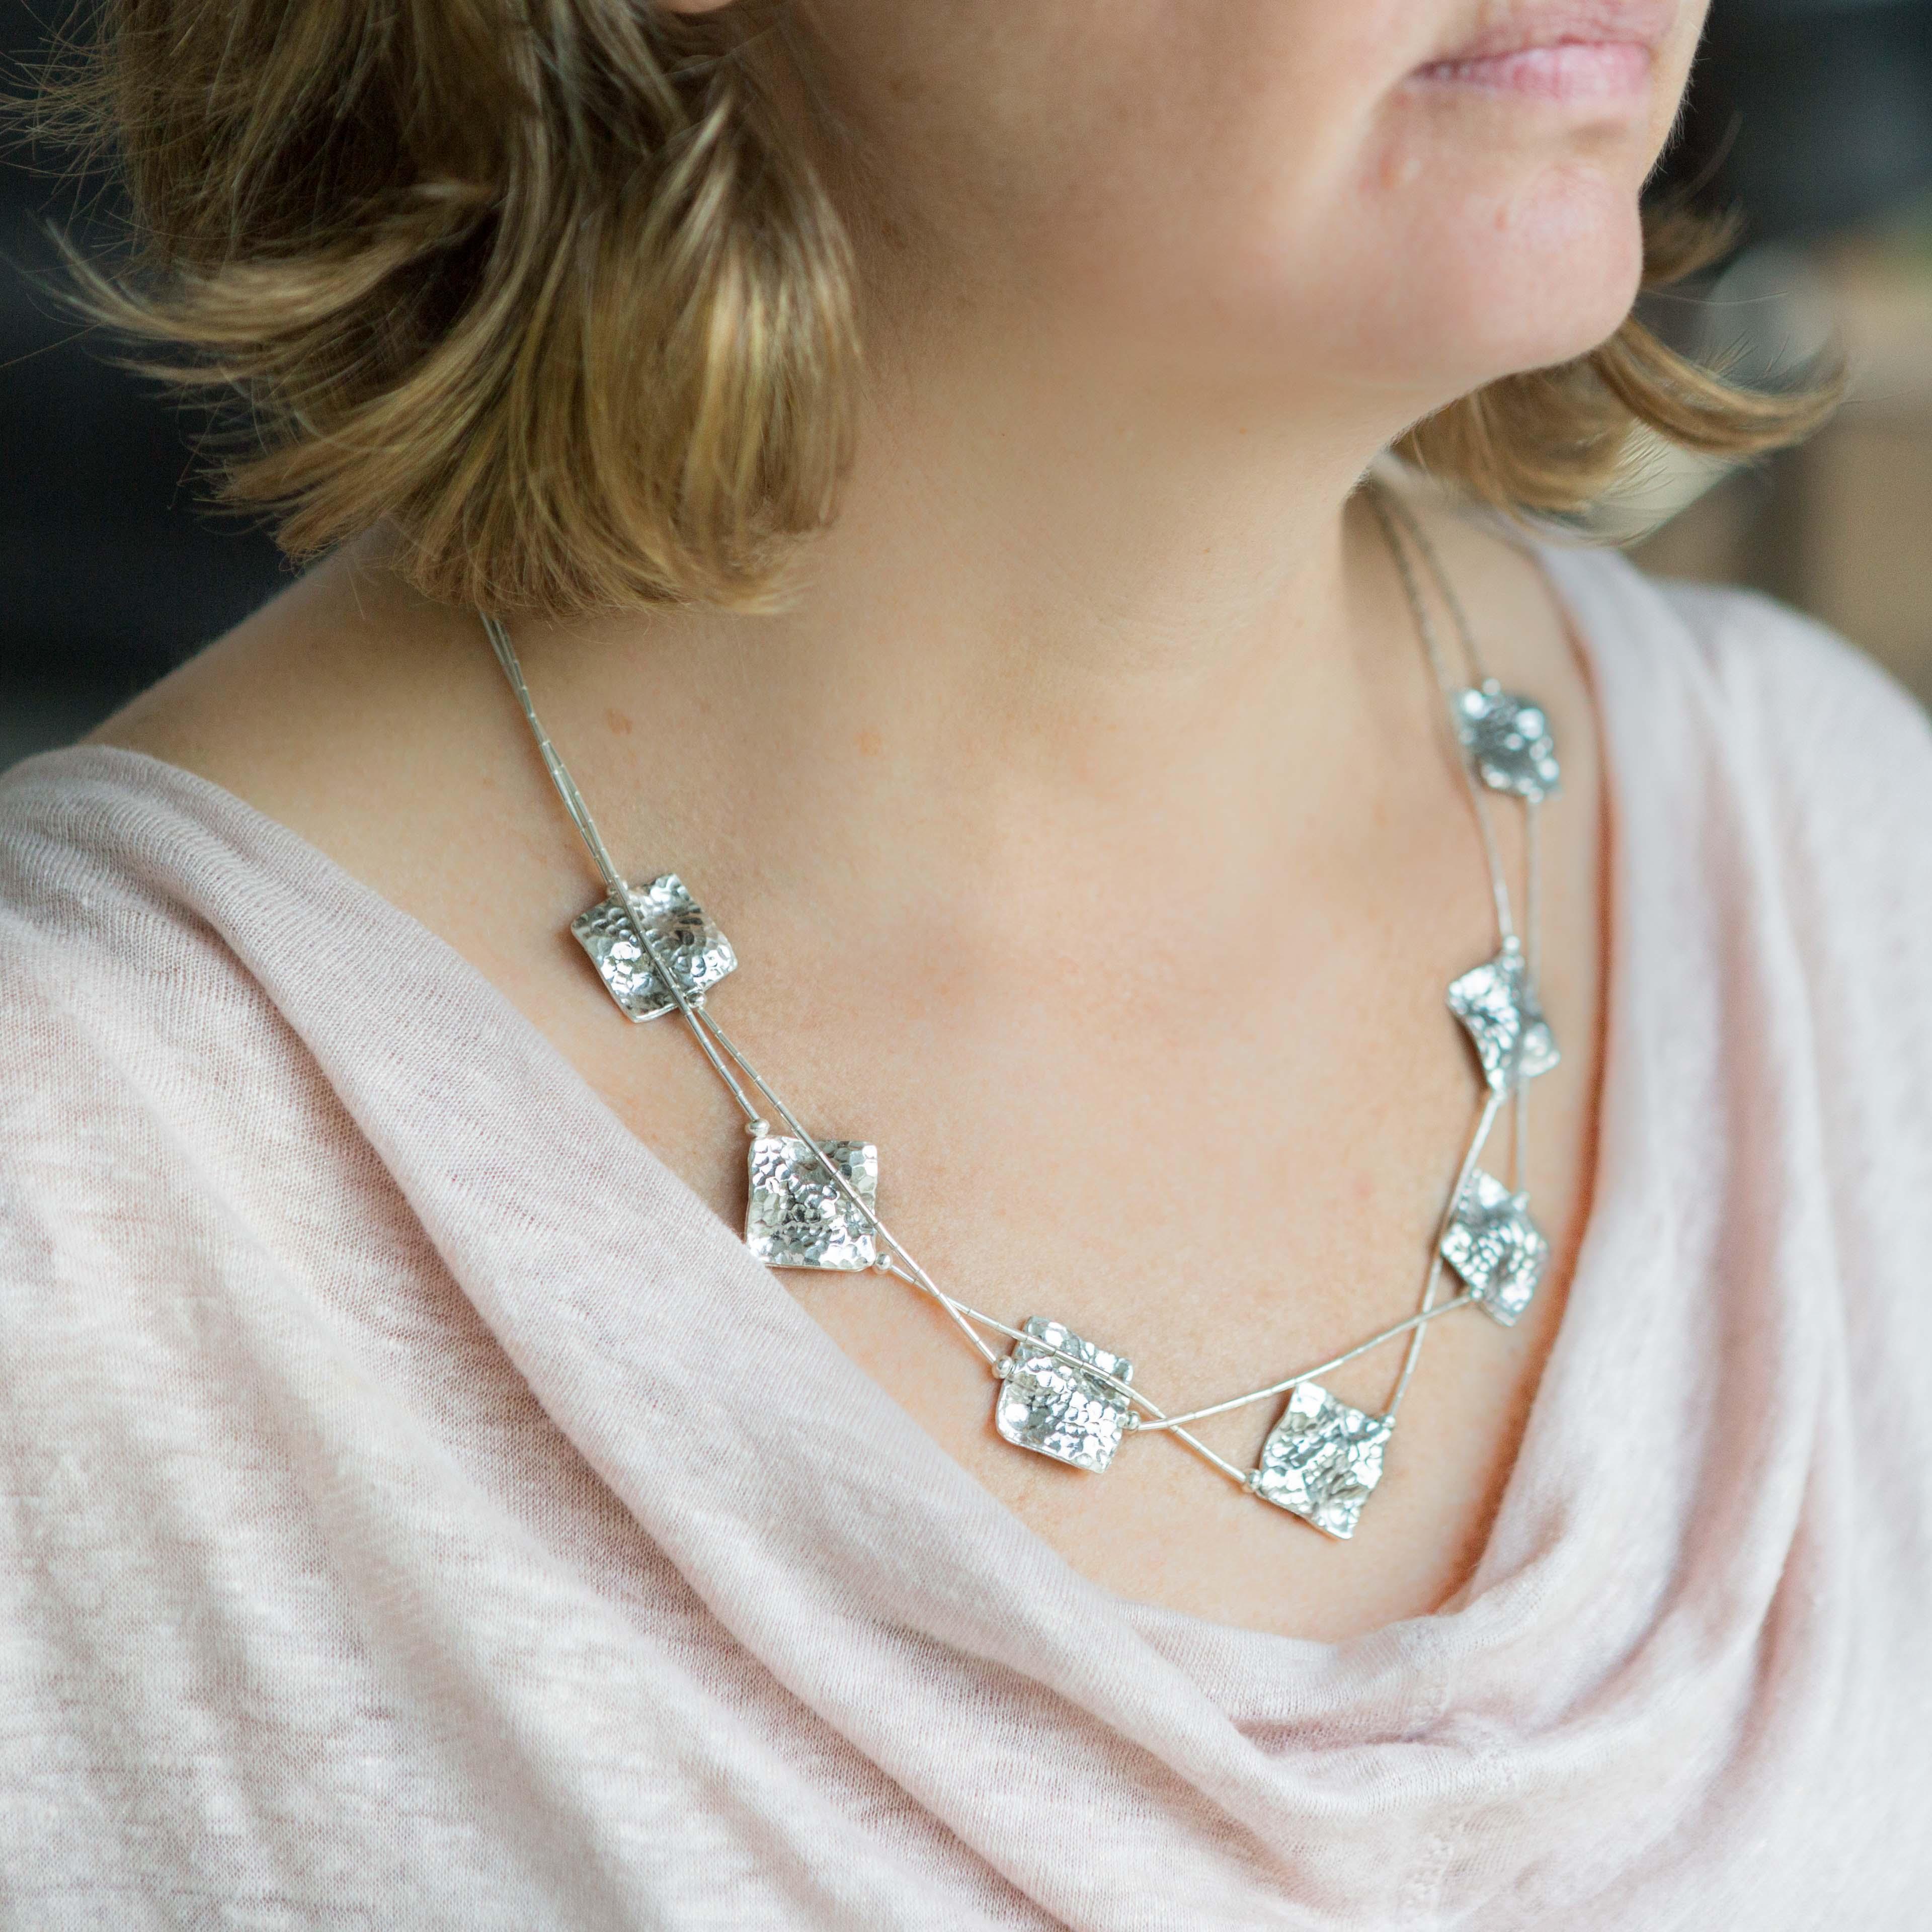 jewellery model studio commercial photographer photoshoot product